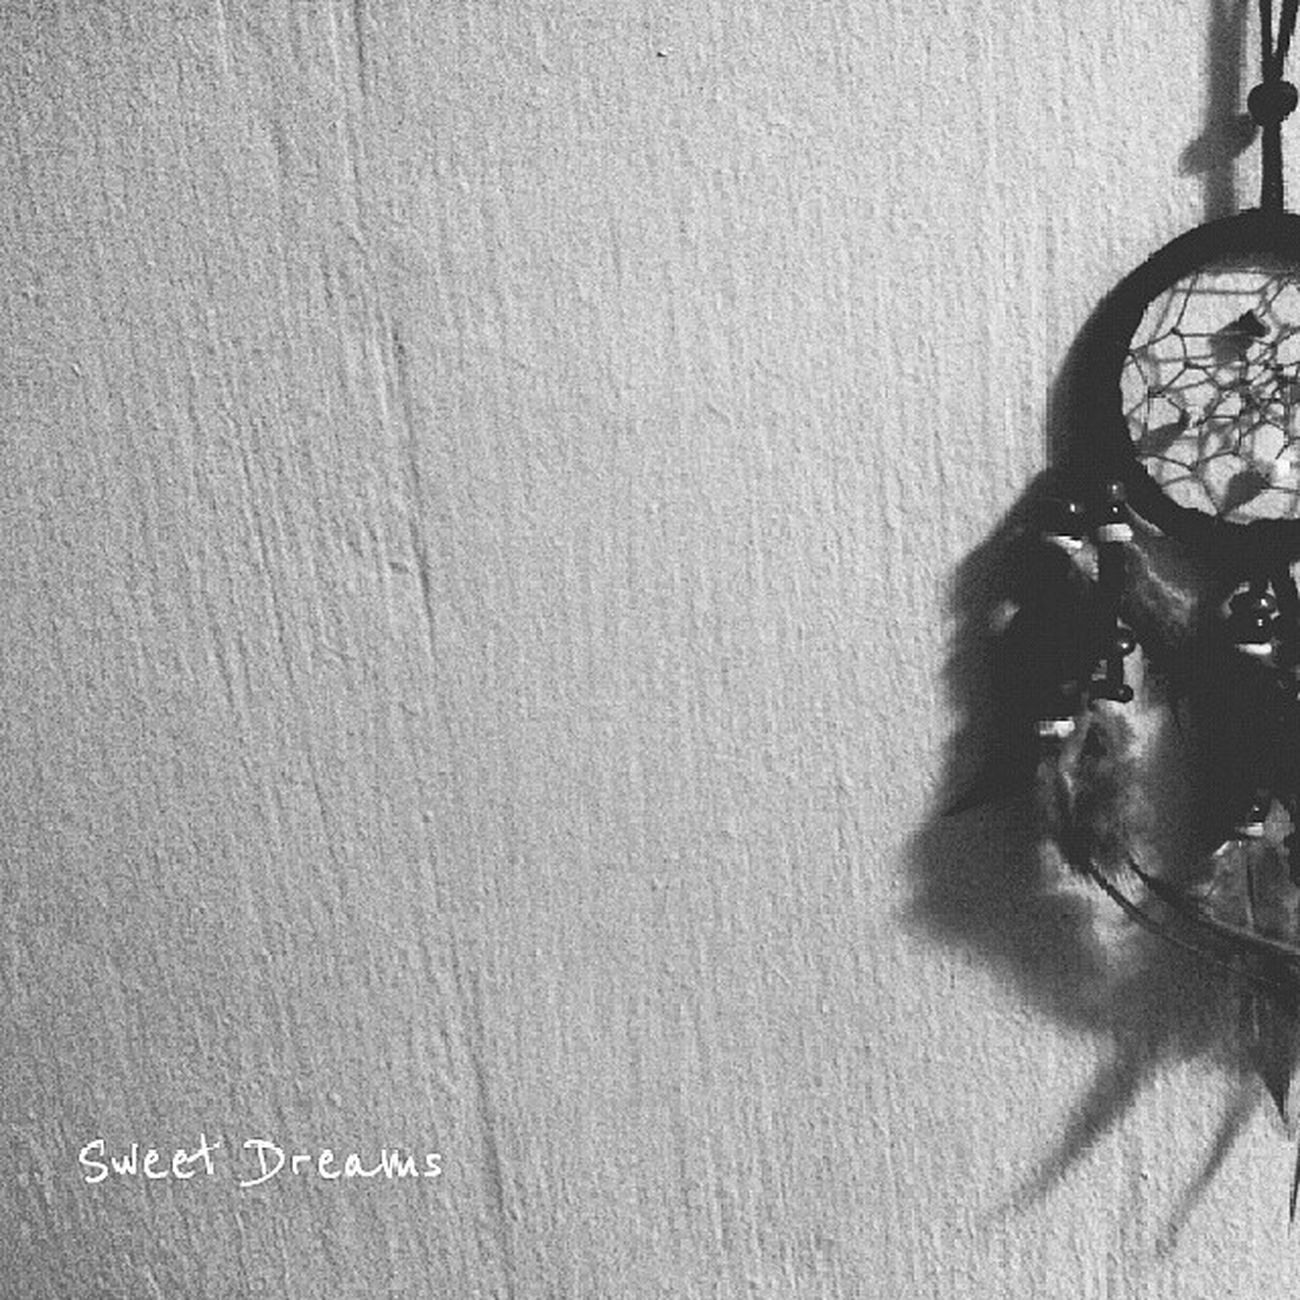 A gift from thailand Goodnight Dreamcatcher Monochrome Igfotogram_4bw